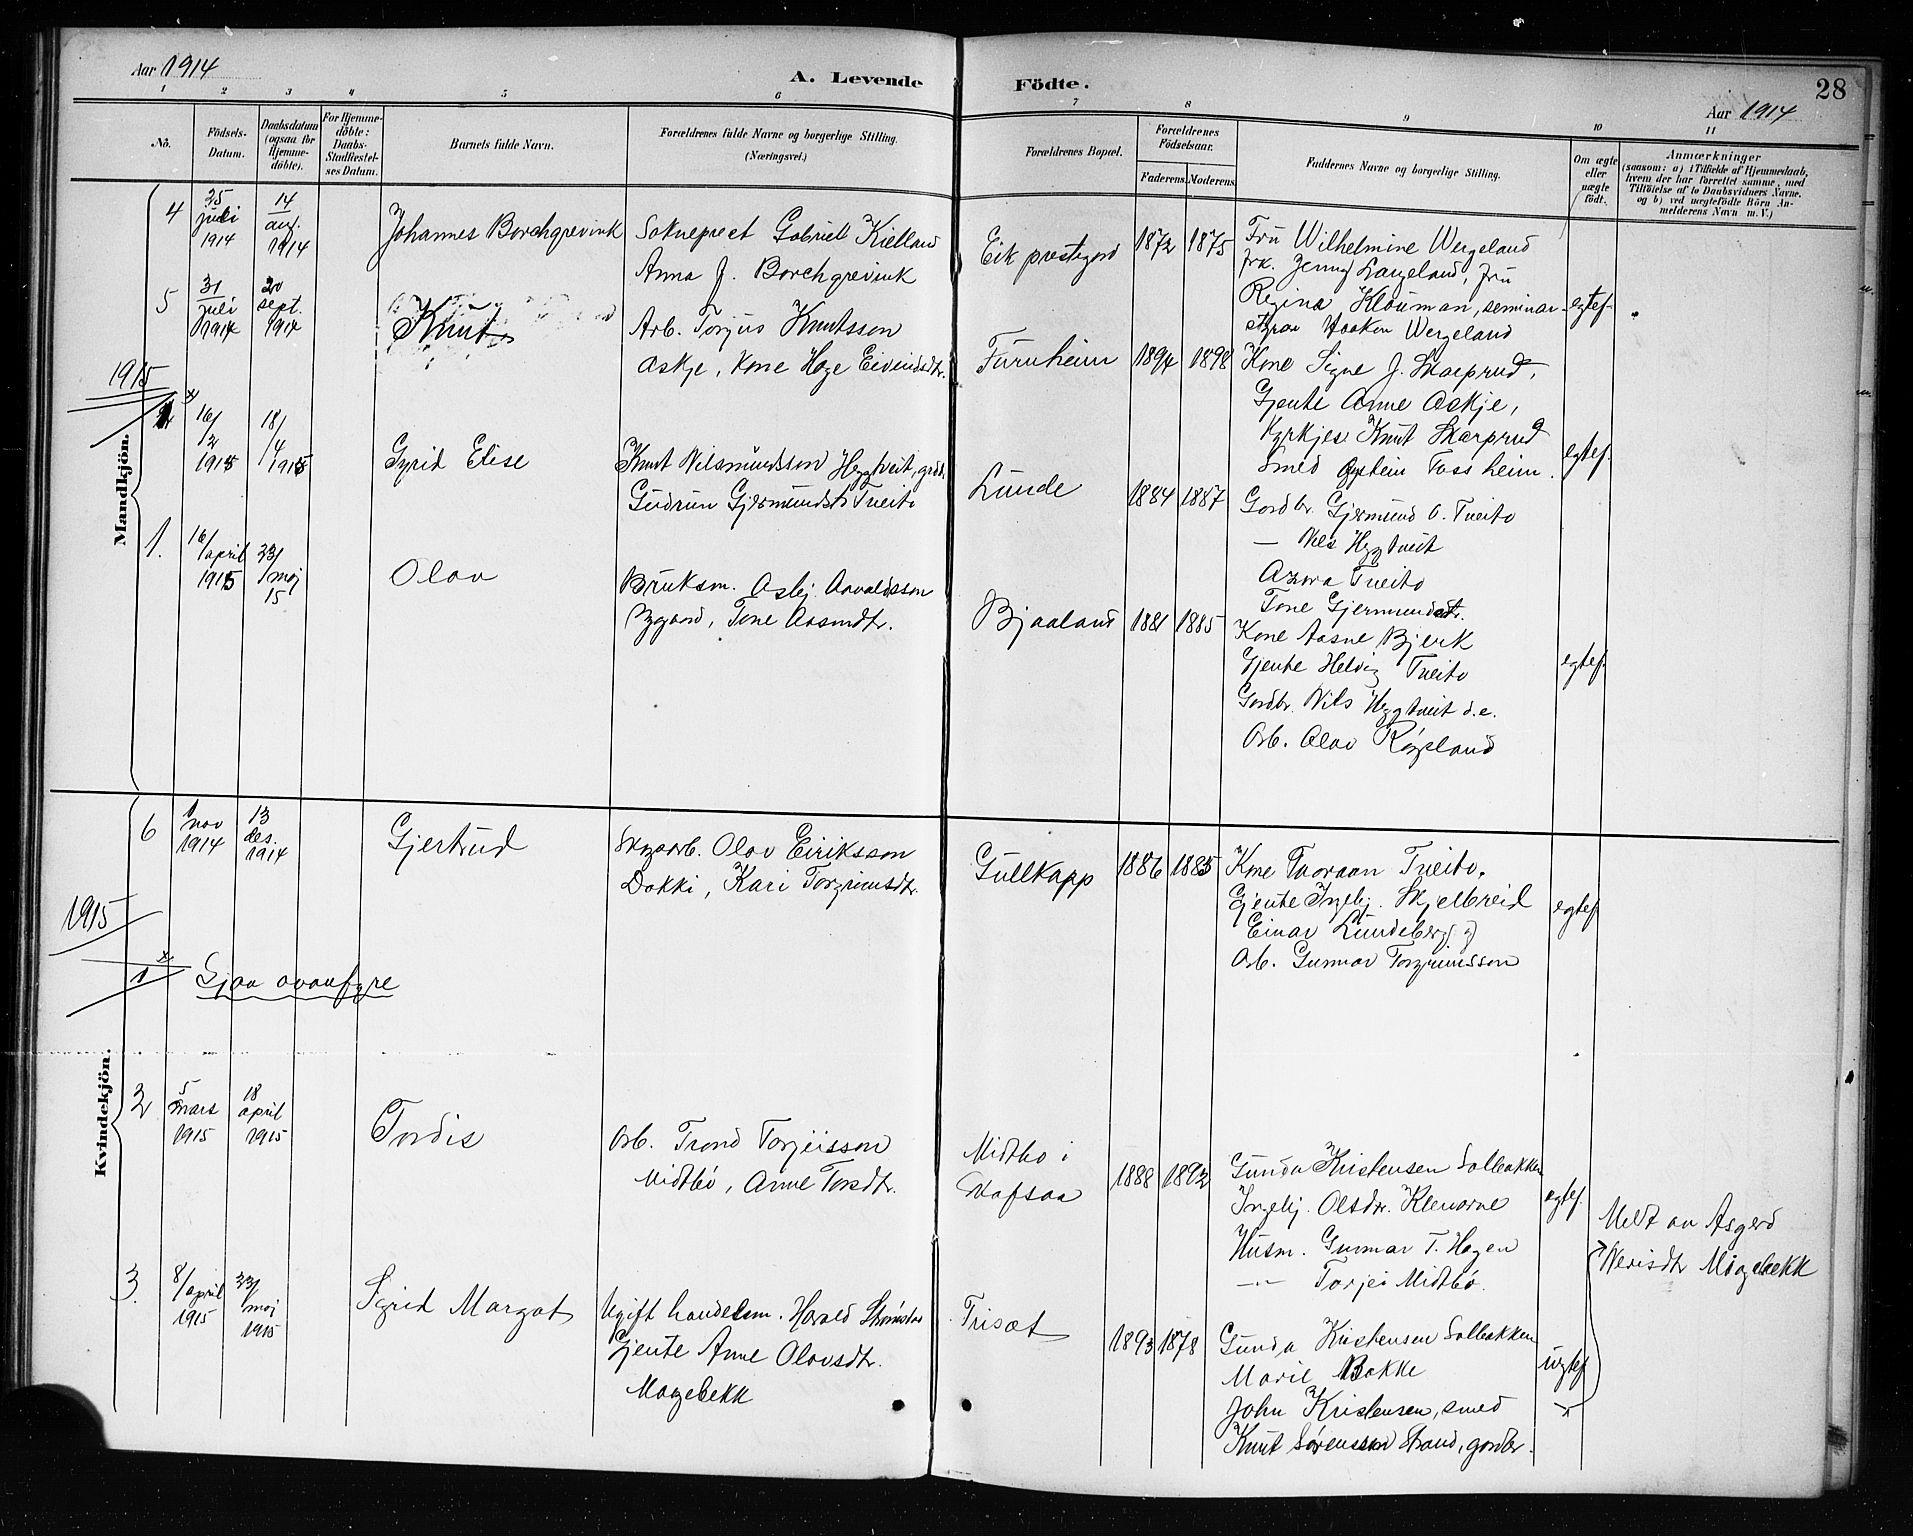 SAKO, Lårdal kirkebøker, G/Ga/L0003: Klokkerbok nr. I 3, 1891-1918, s. 28